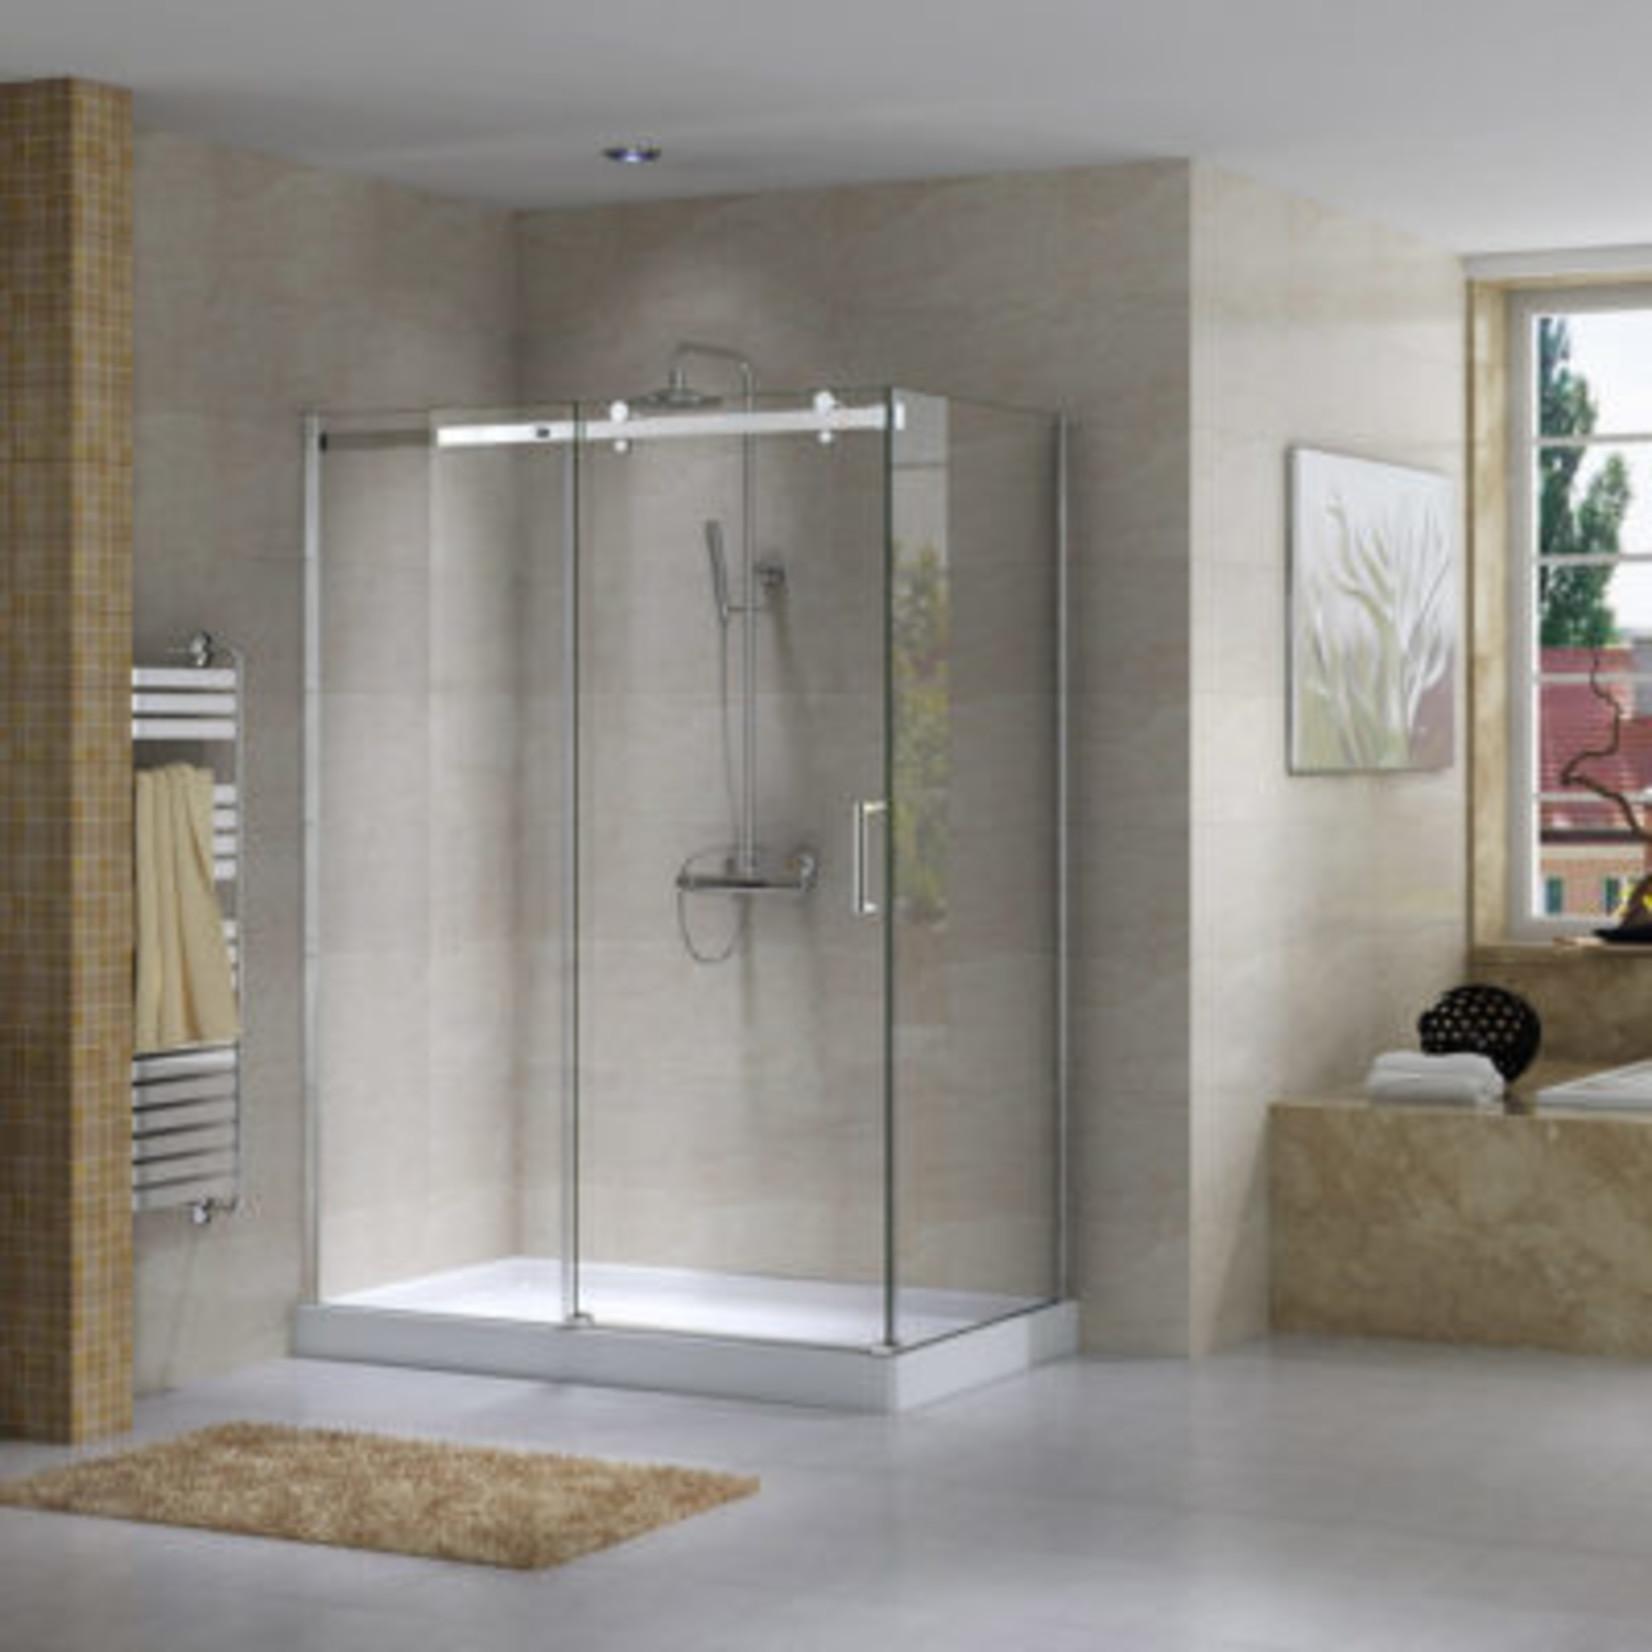 Reversible shower set 32x72 chrome Quartz Jade series